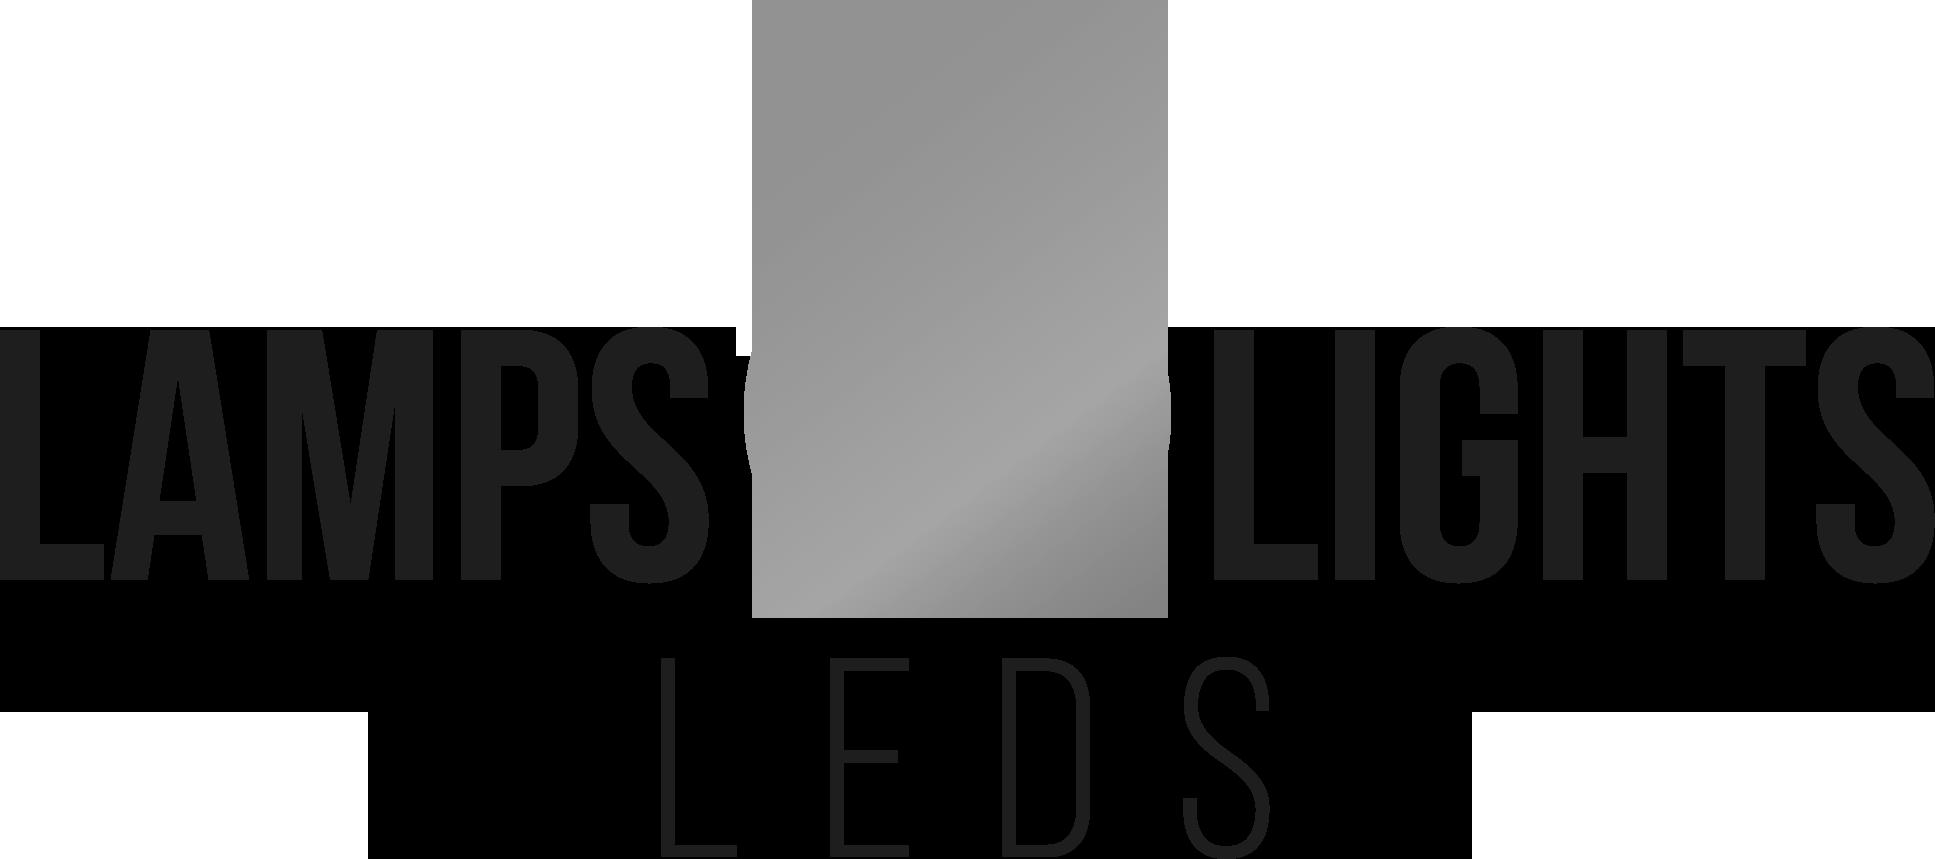 Lamps Lights LEDs